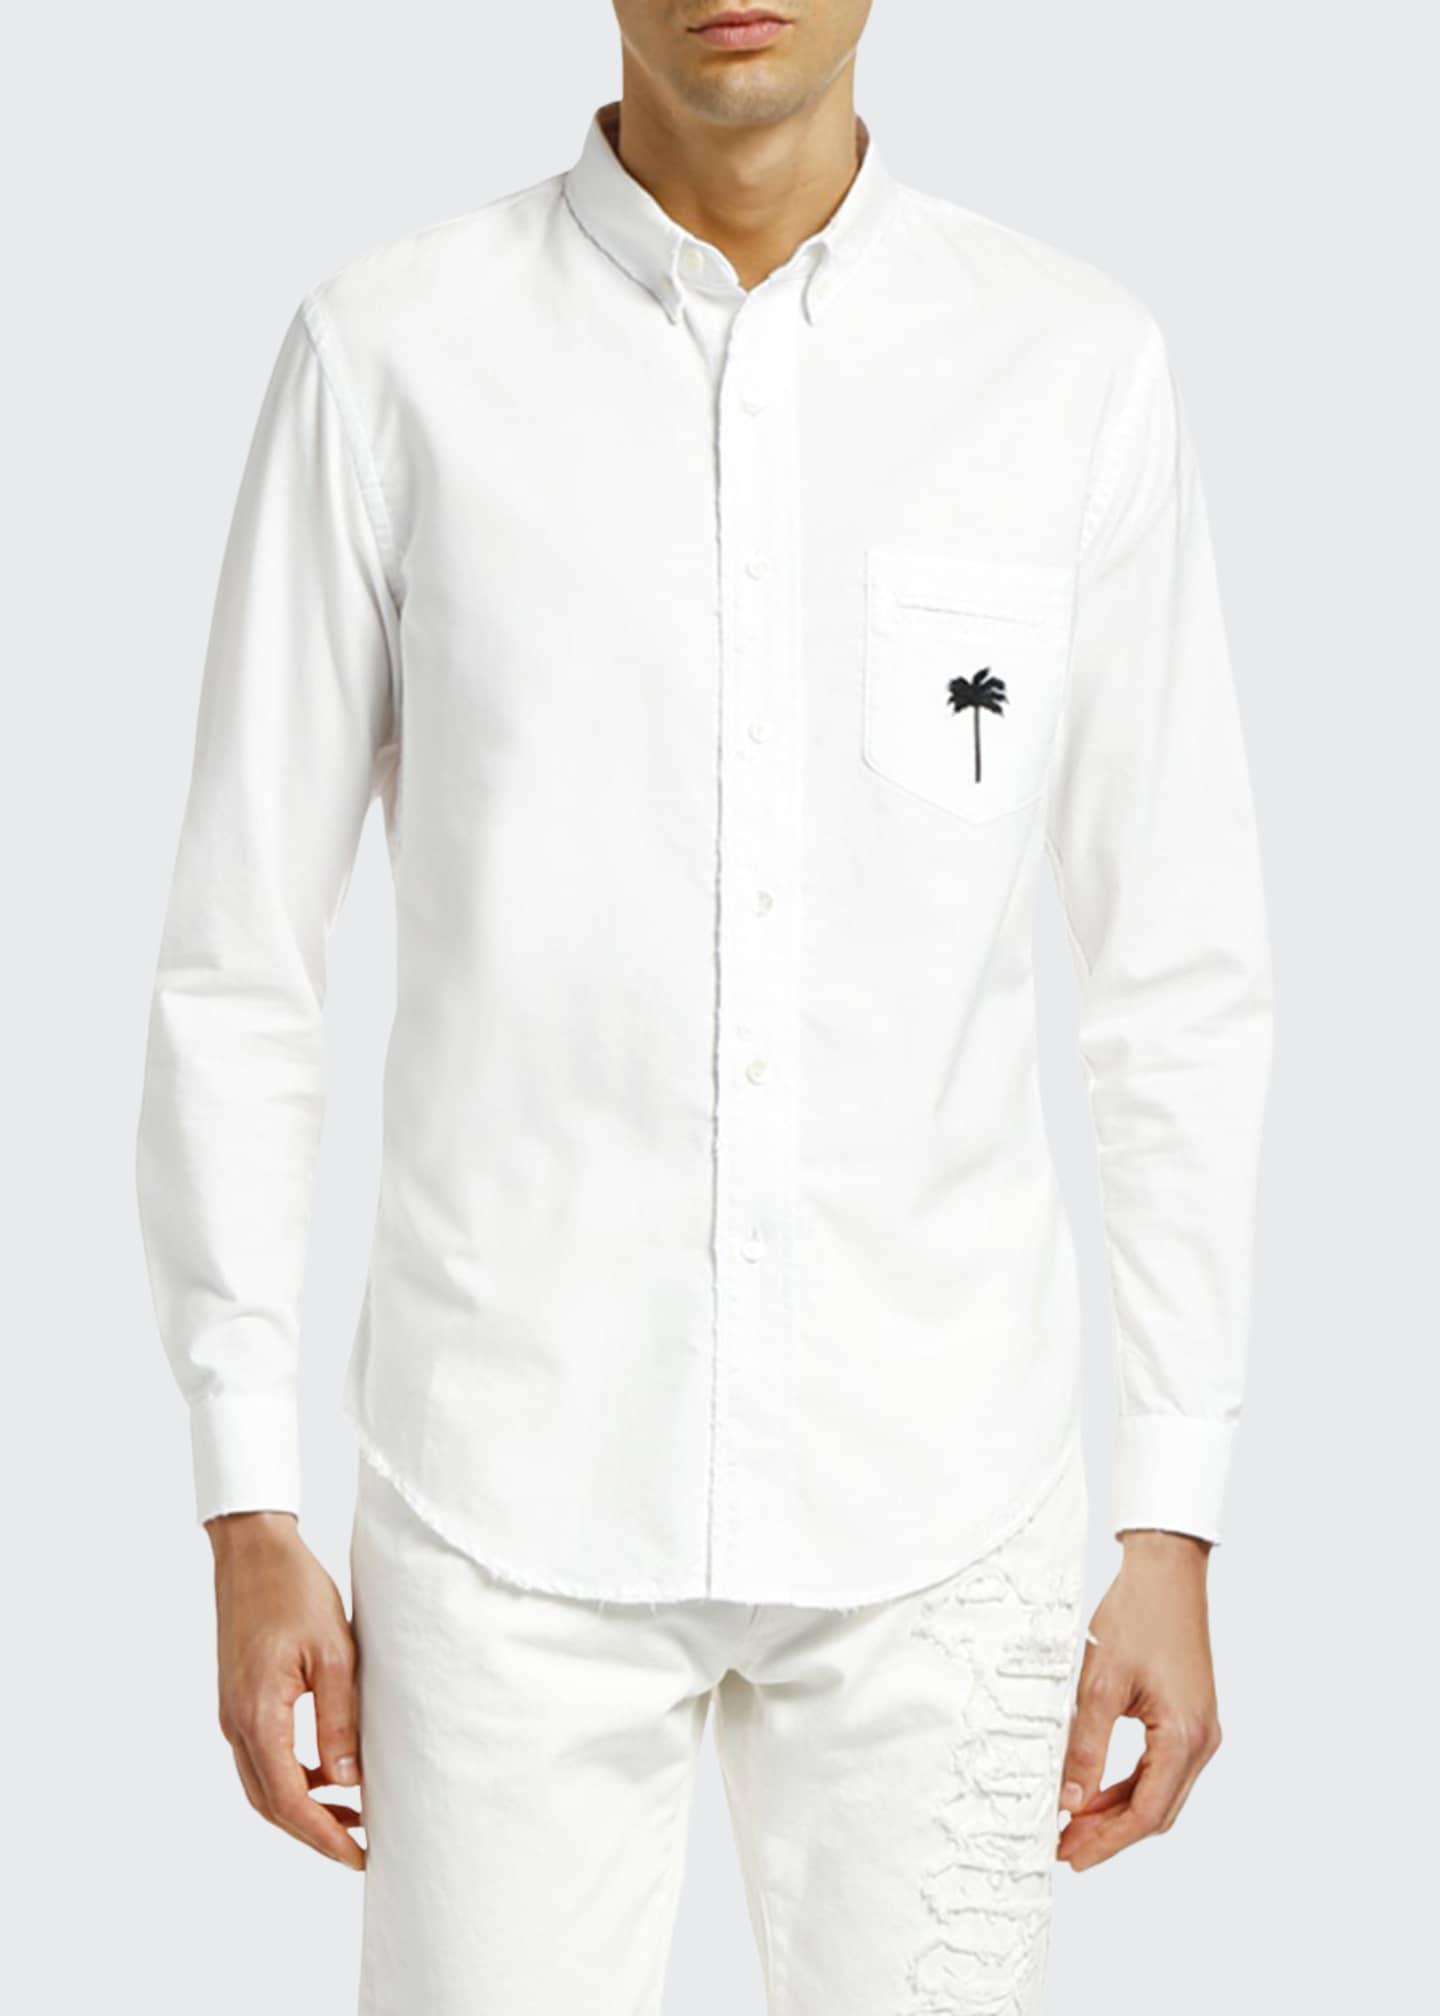 Palm Angels Men's PXP Ripped Oxford Shirt